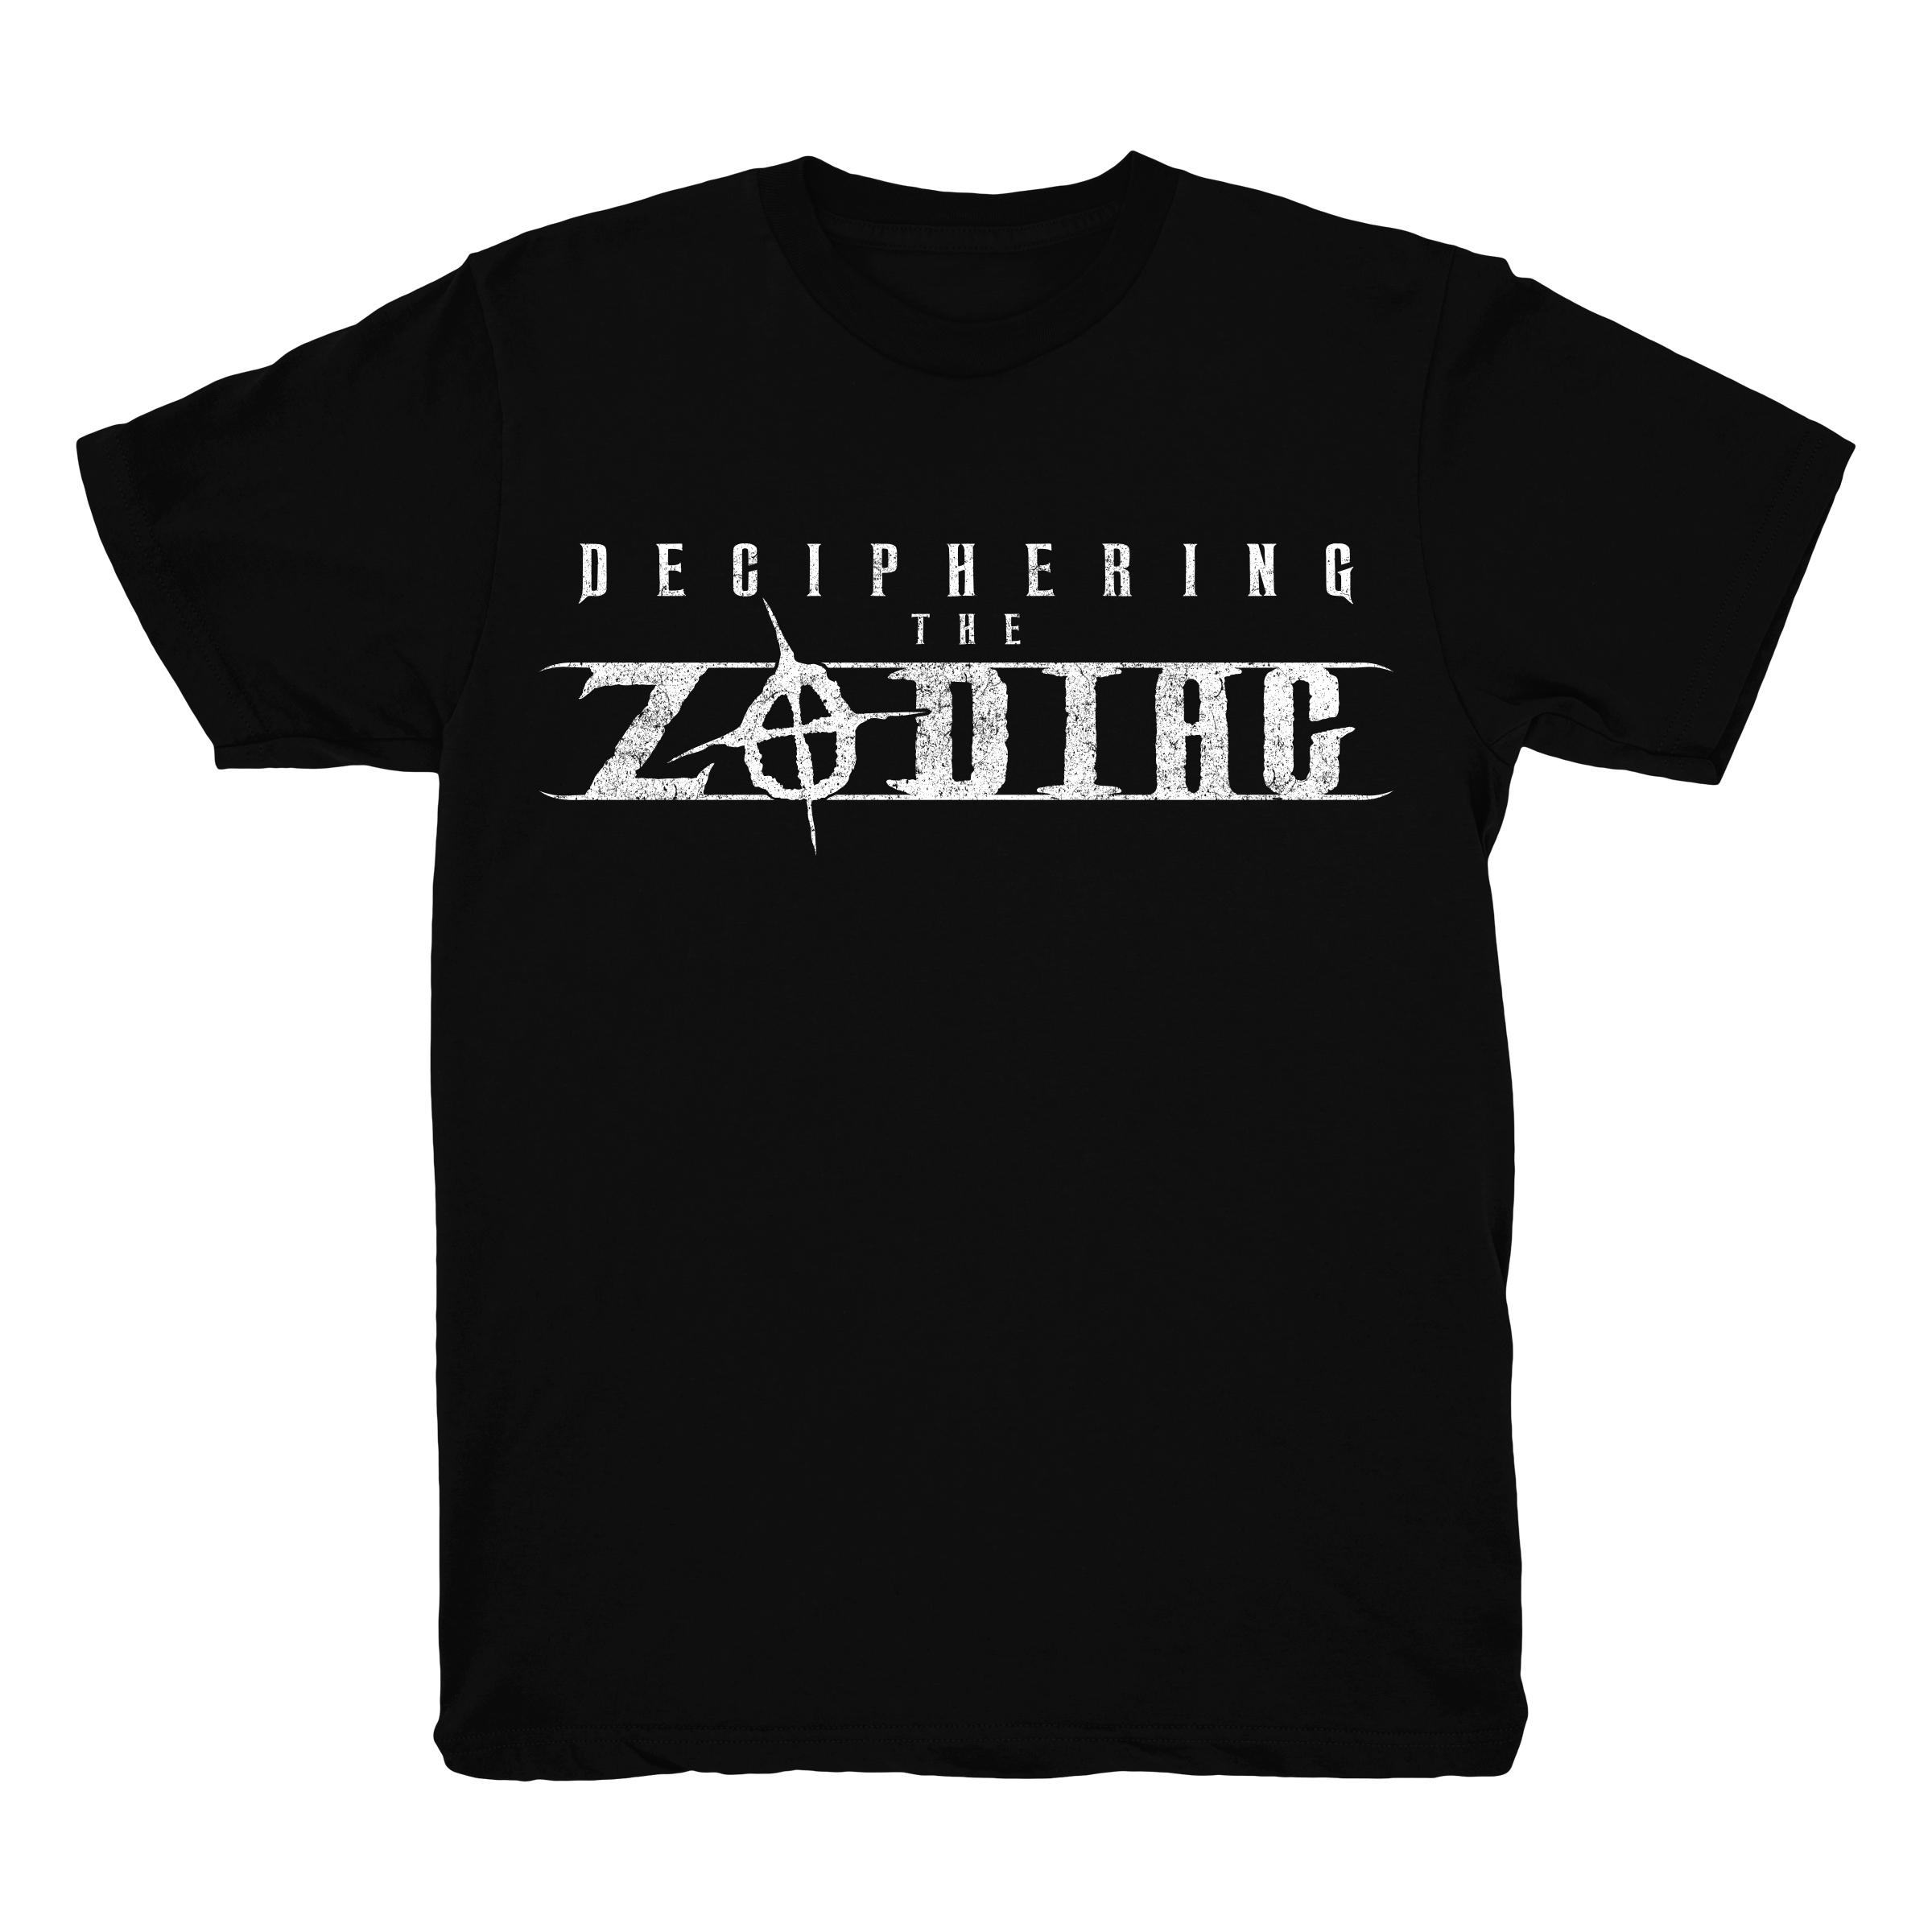 Deciphering The Zodiac Shirt Mockup.jpg